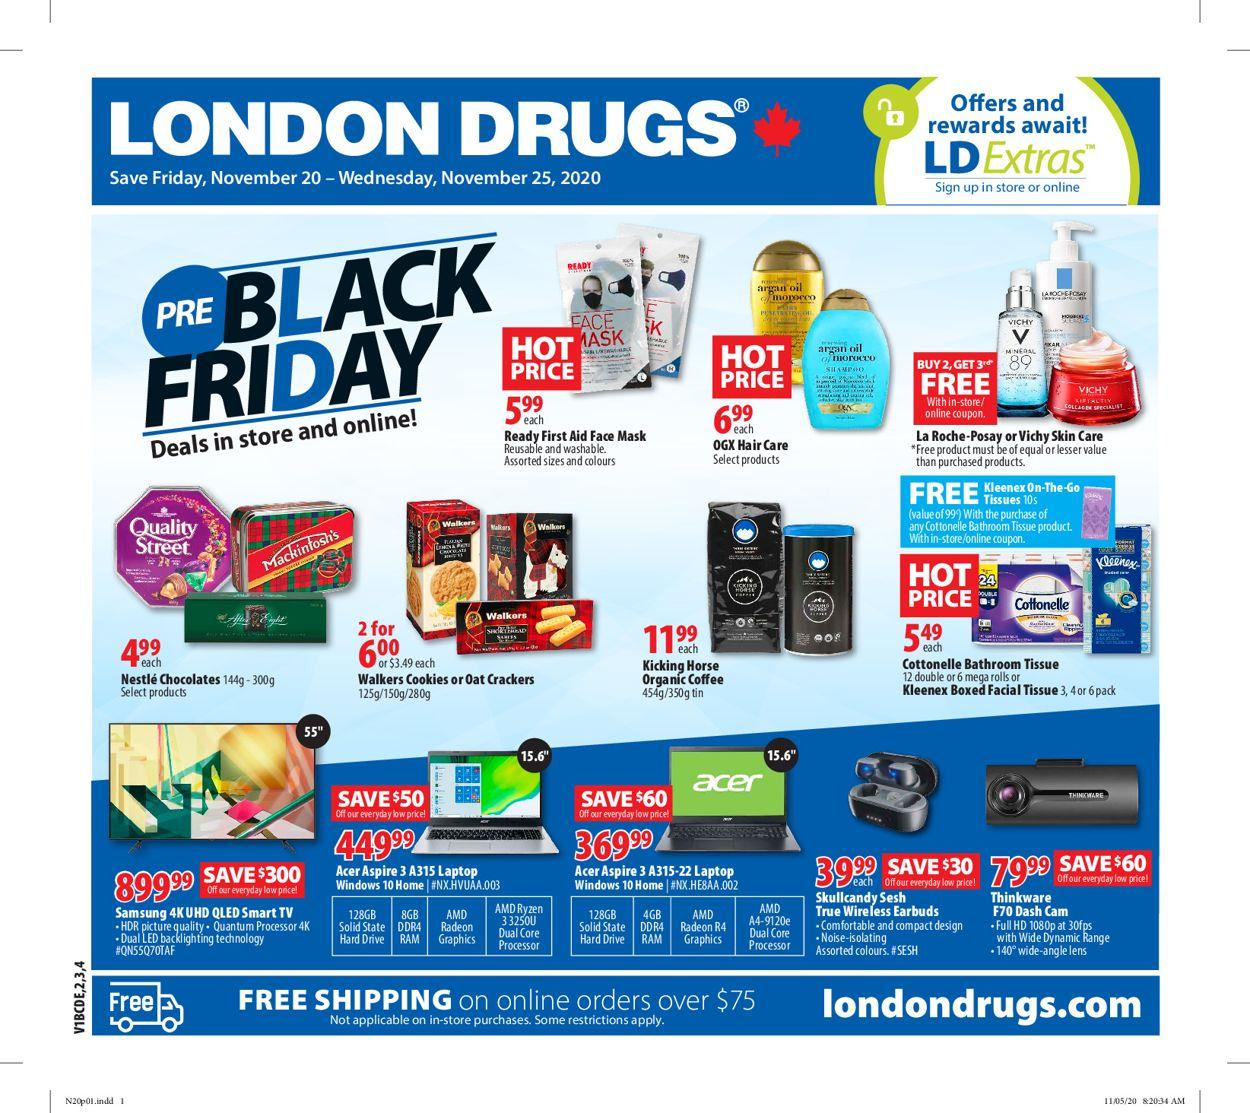 London Drugs - Black Friday 2020 Flyer - 11/20-11/25/2020